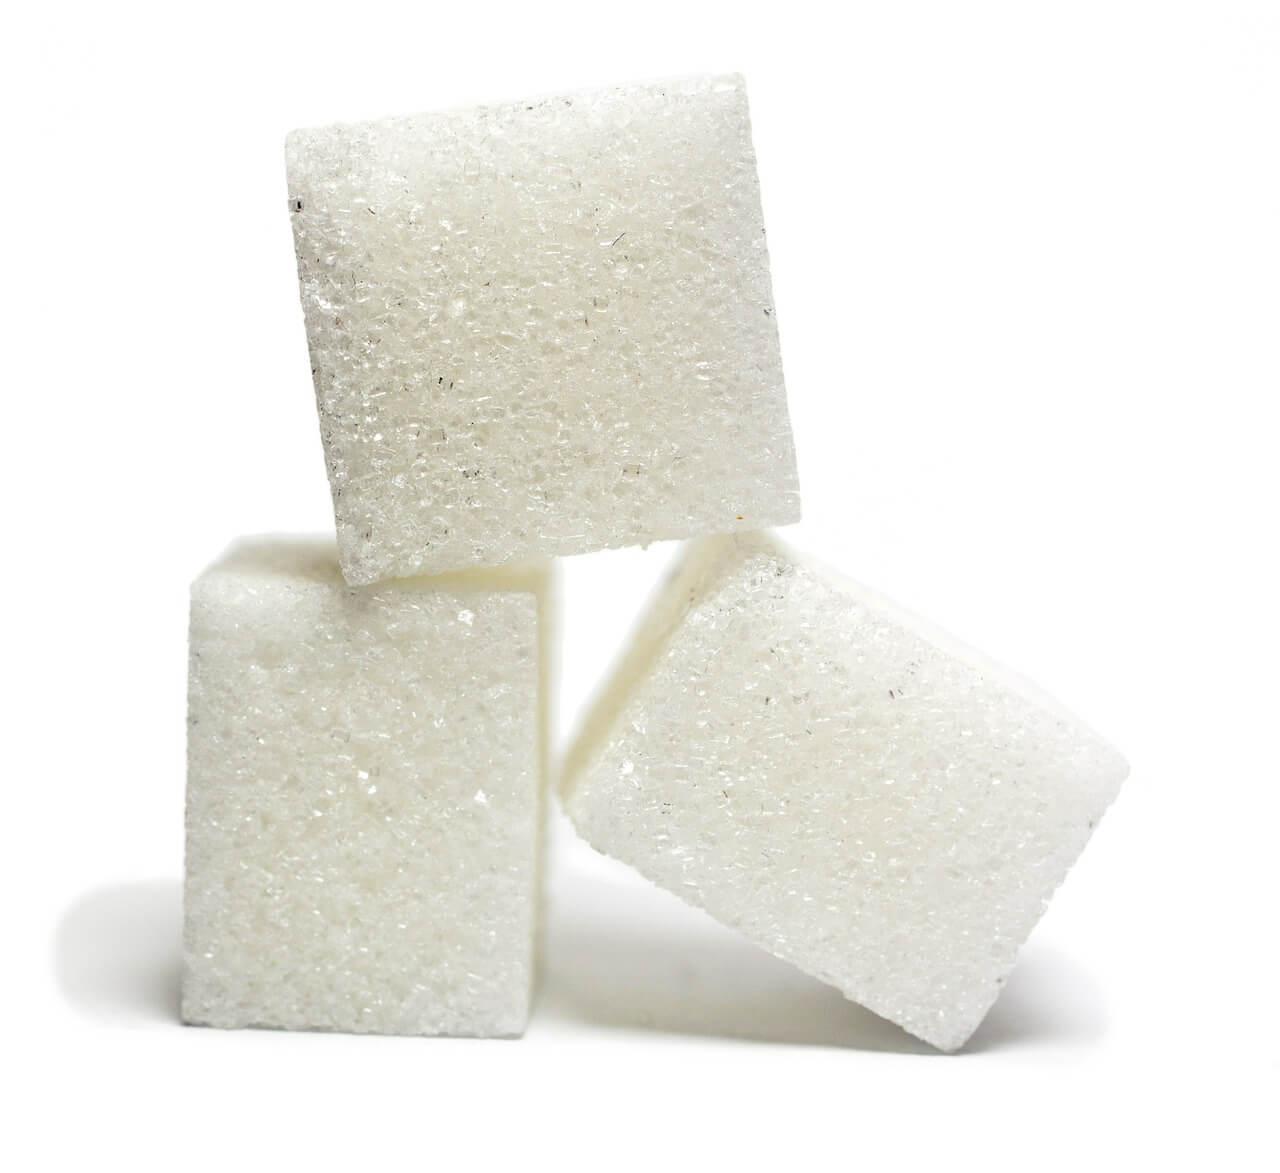 Three sugar cubes.